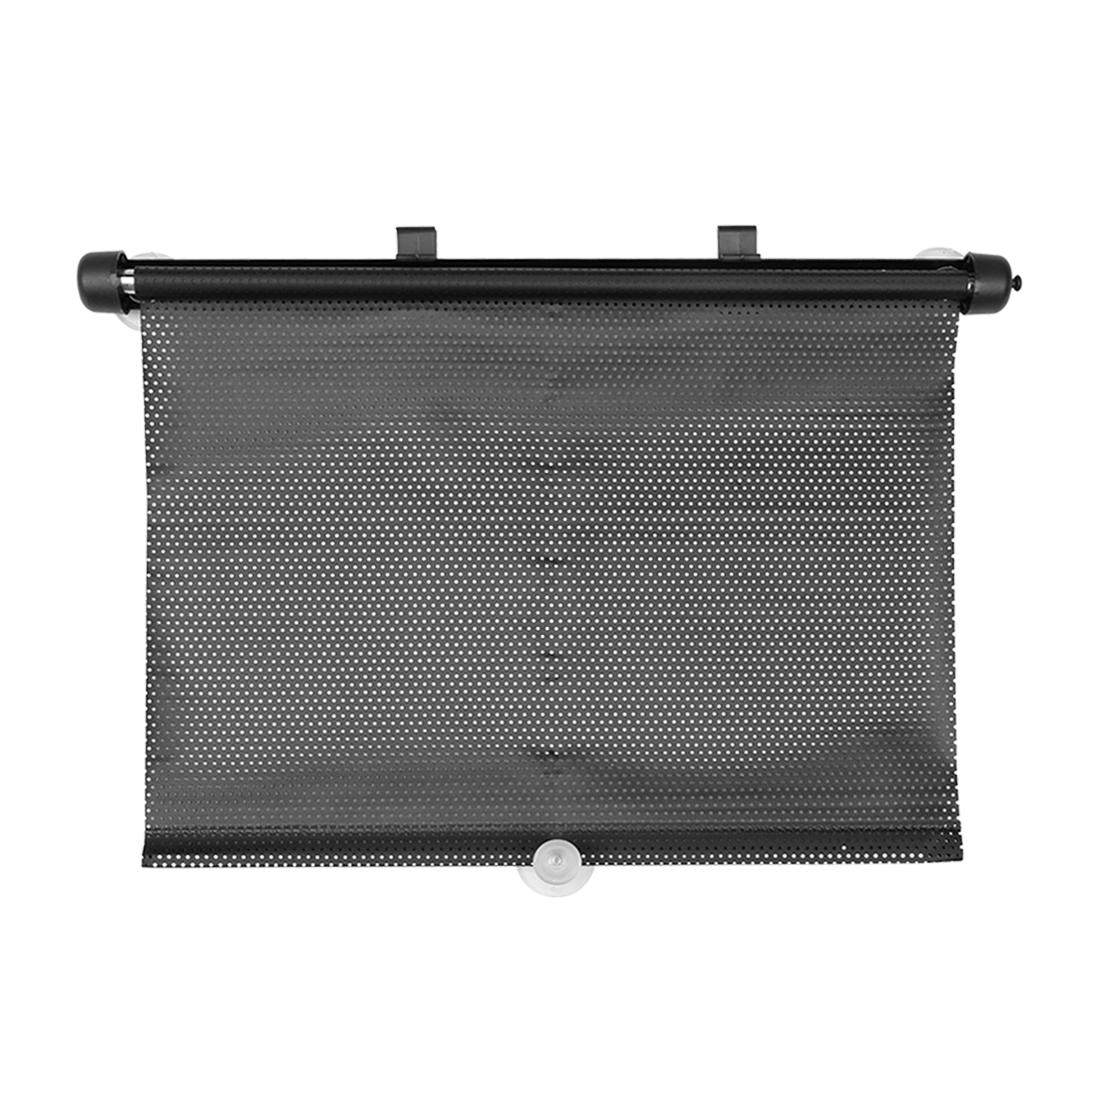 47cm x 36cm Mesh Design Front Rear Window Moount Sun Shield Black Pair for Car